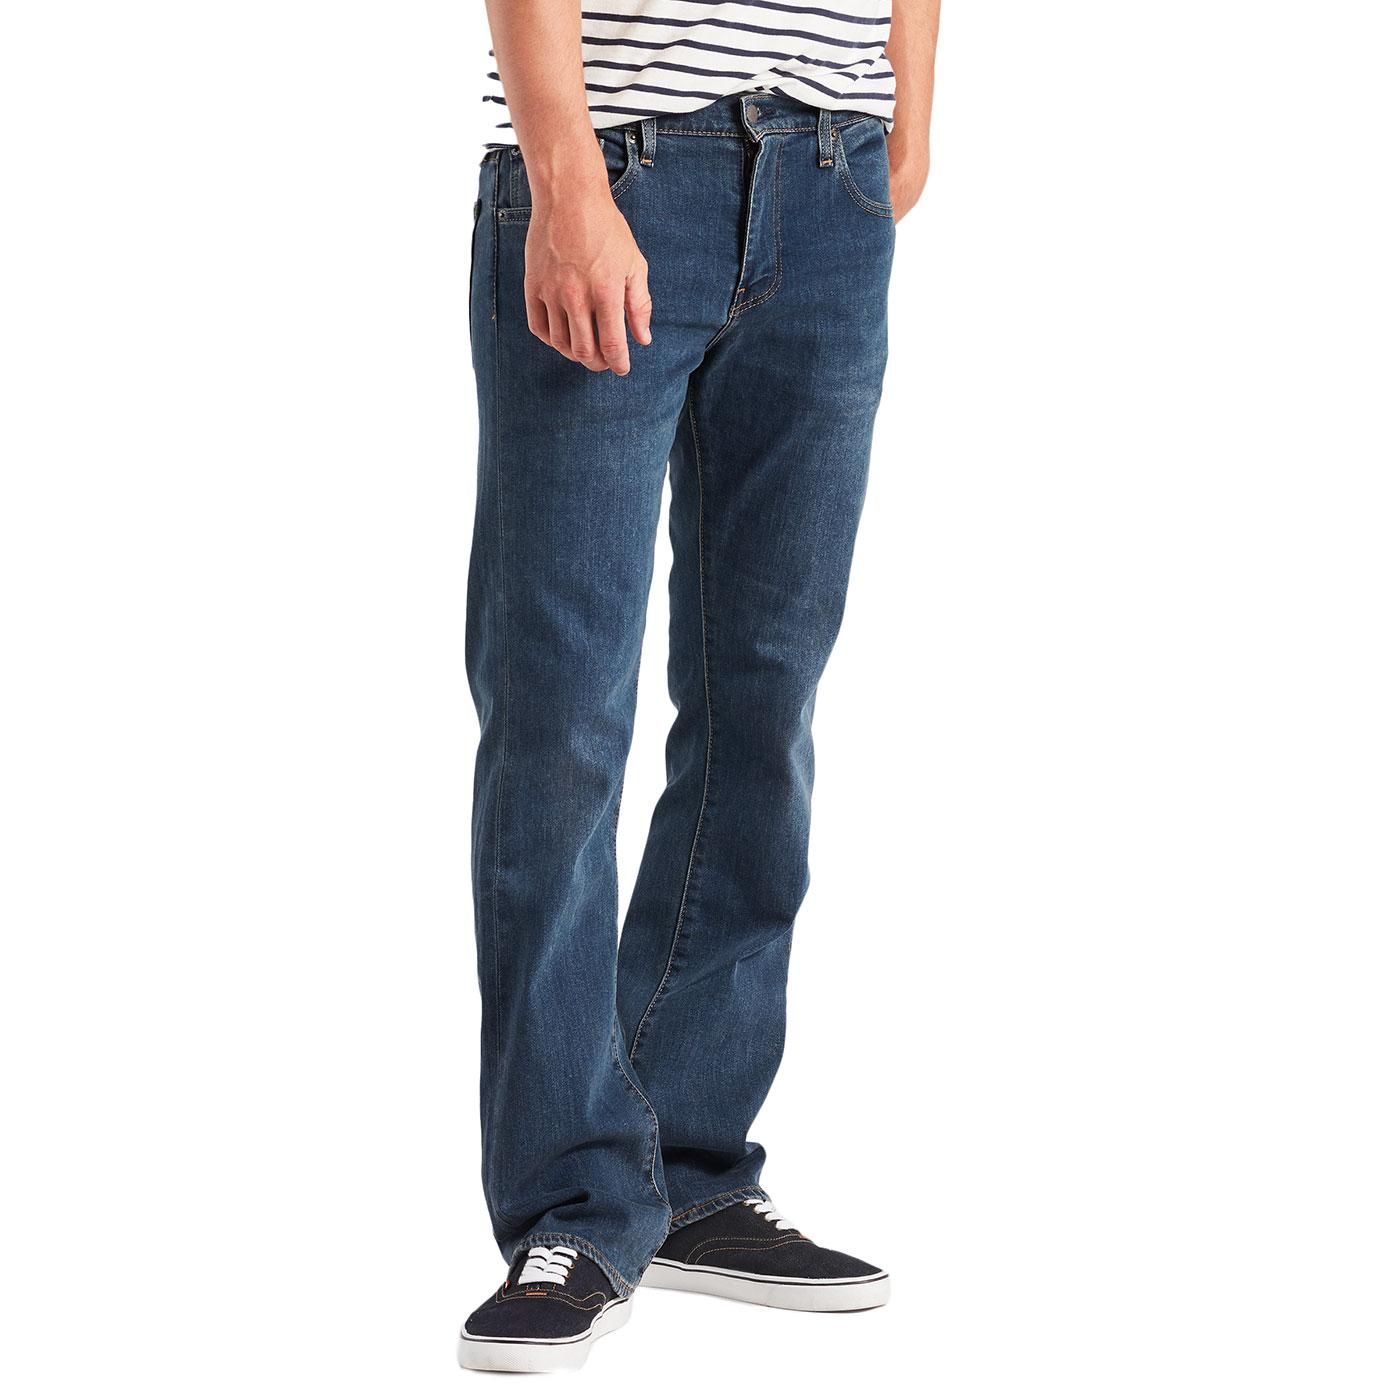 LEVI'S 527 Retro Slim Boot Cut Jeans (Mid Blue)